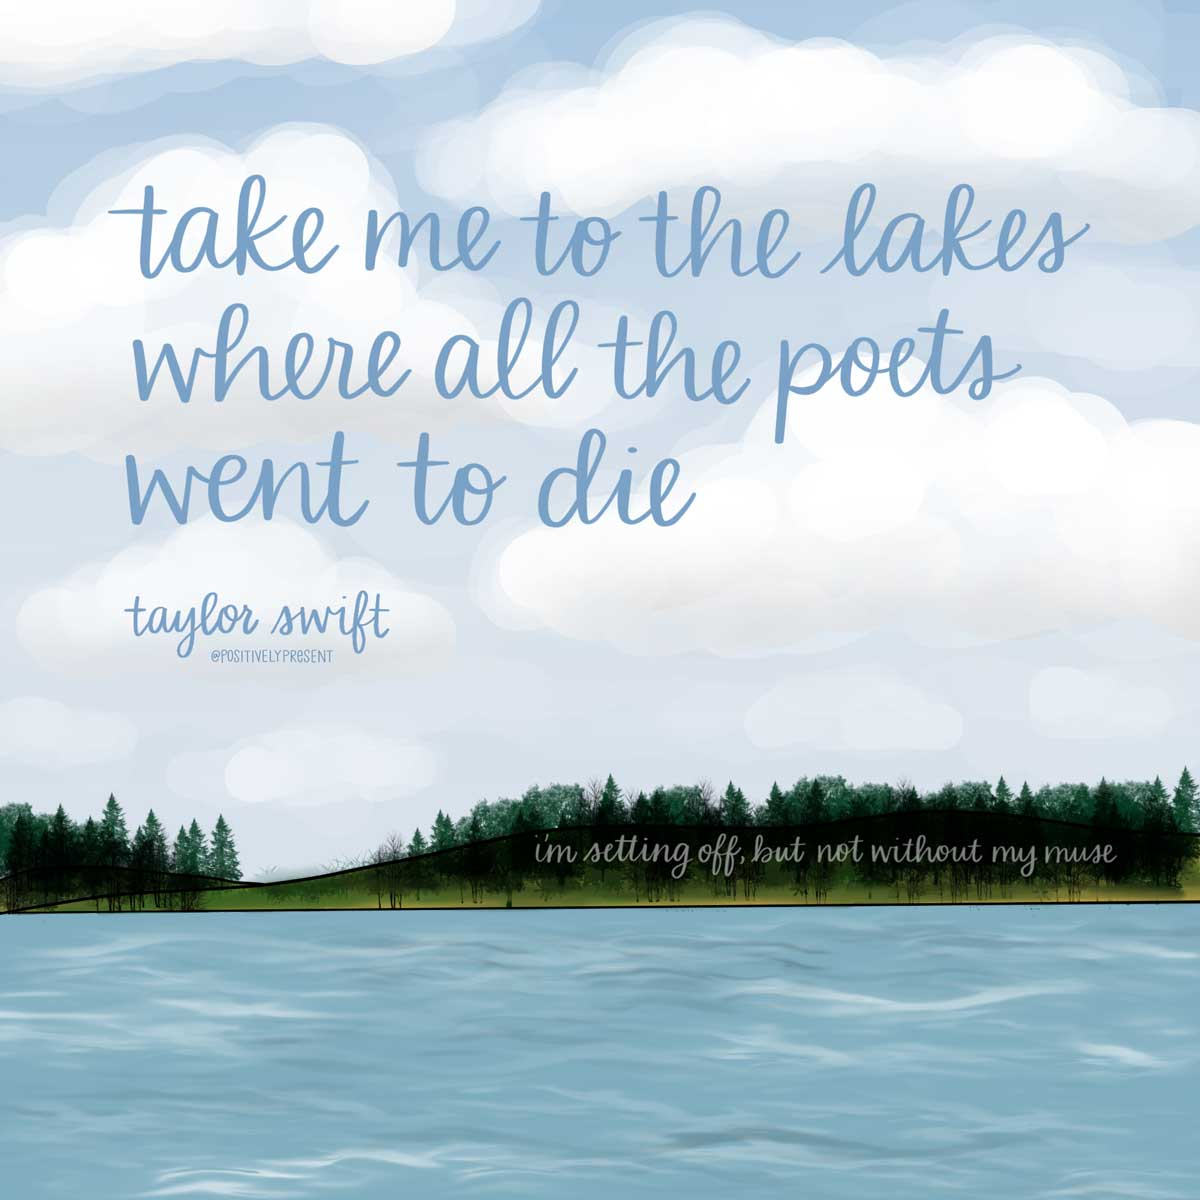 take me to the lakes taylor swift lyrics on drawing of lake and sky.